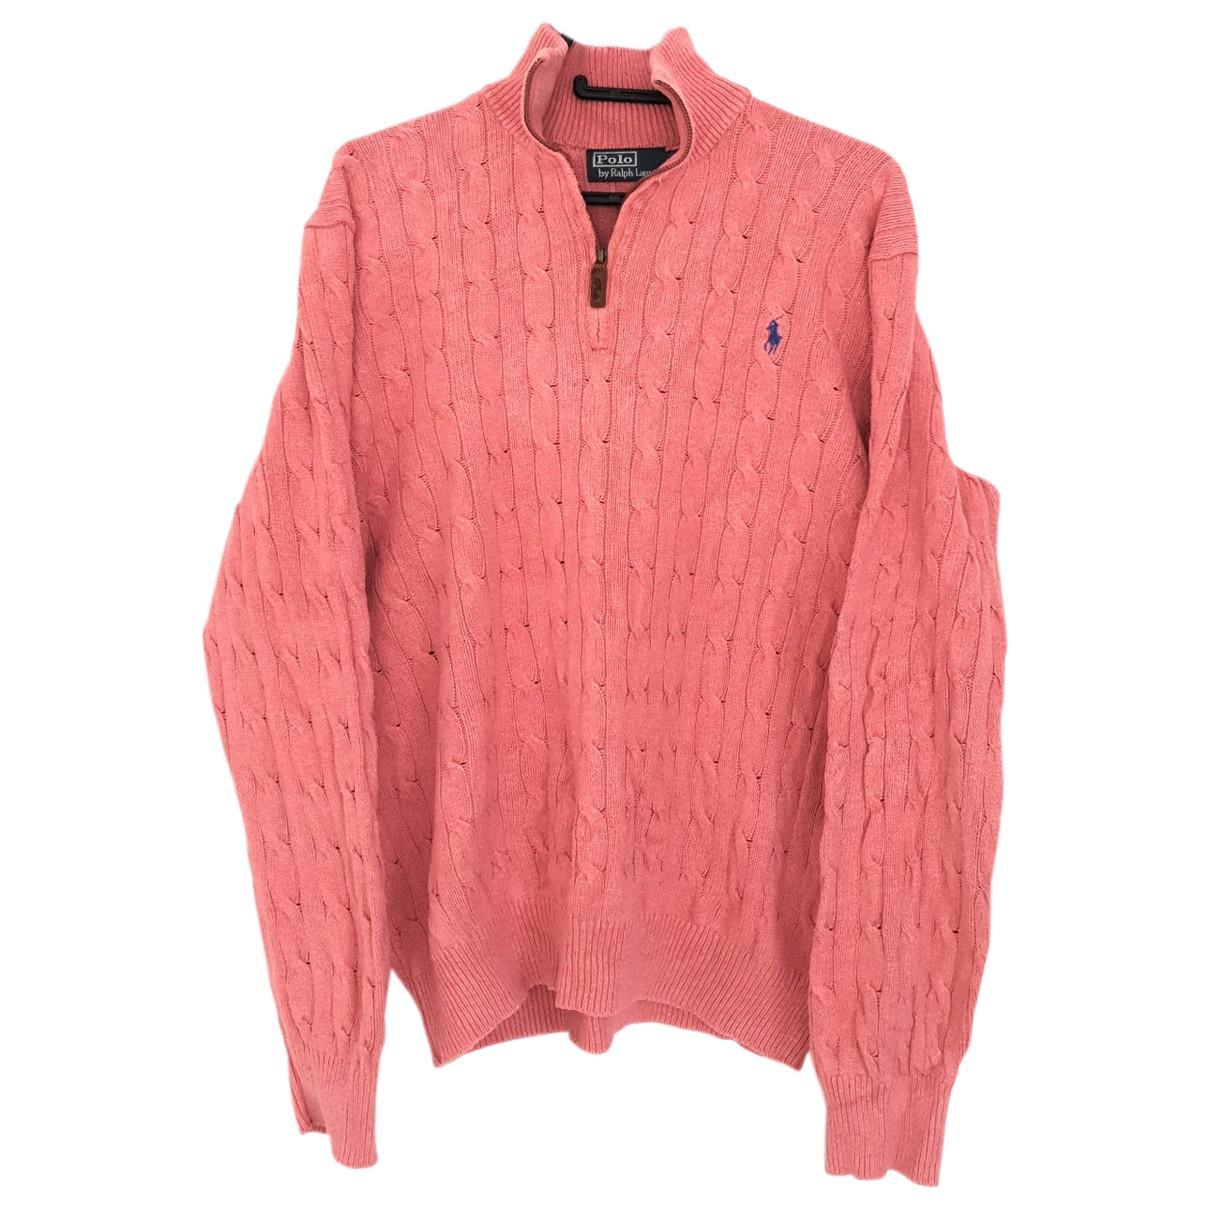 Polo Ralph Lauren \N Pink Cotton Knitwear & Sweatshirts for Men XL International